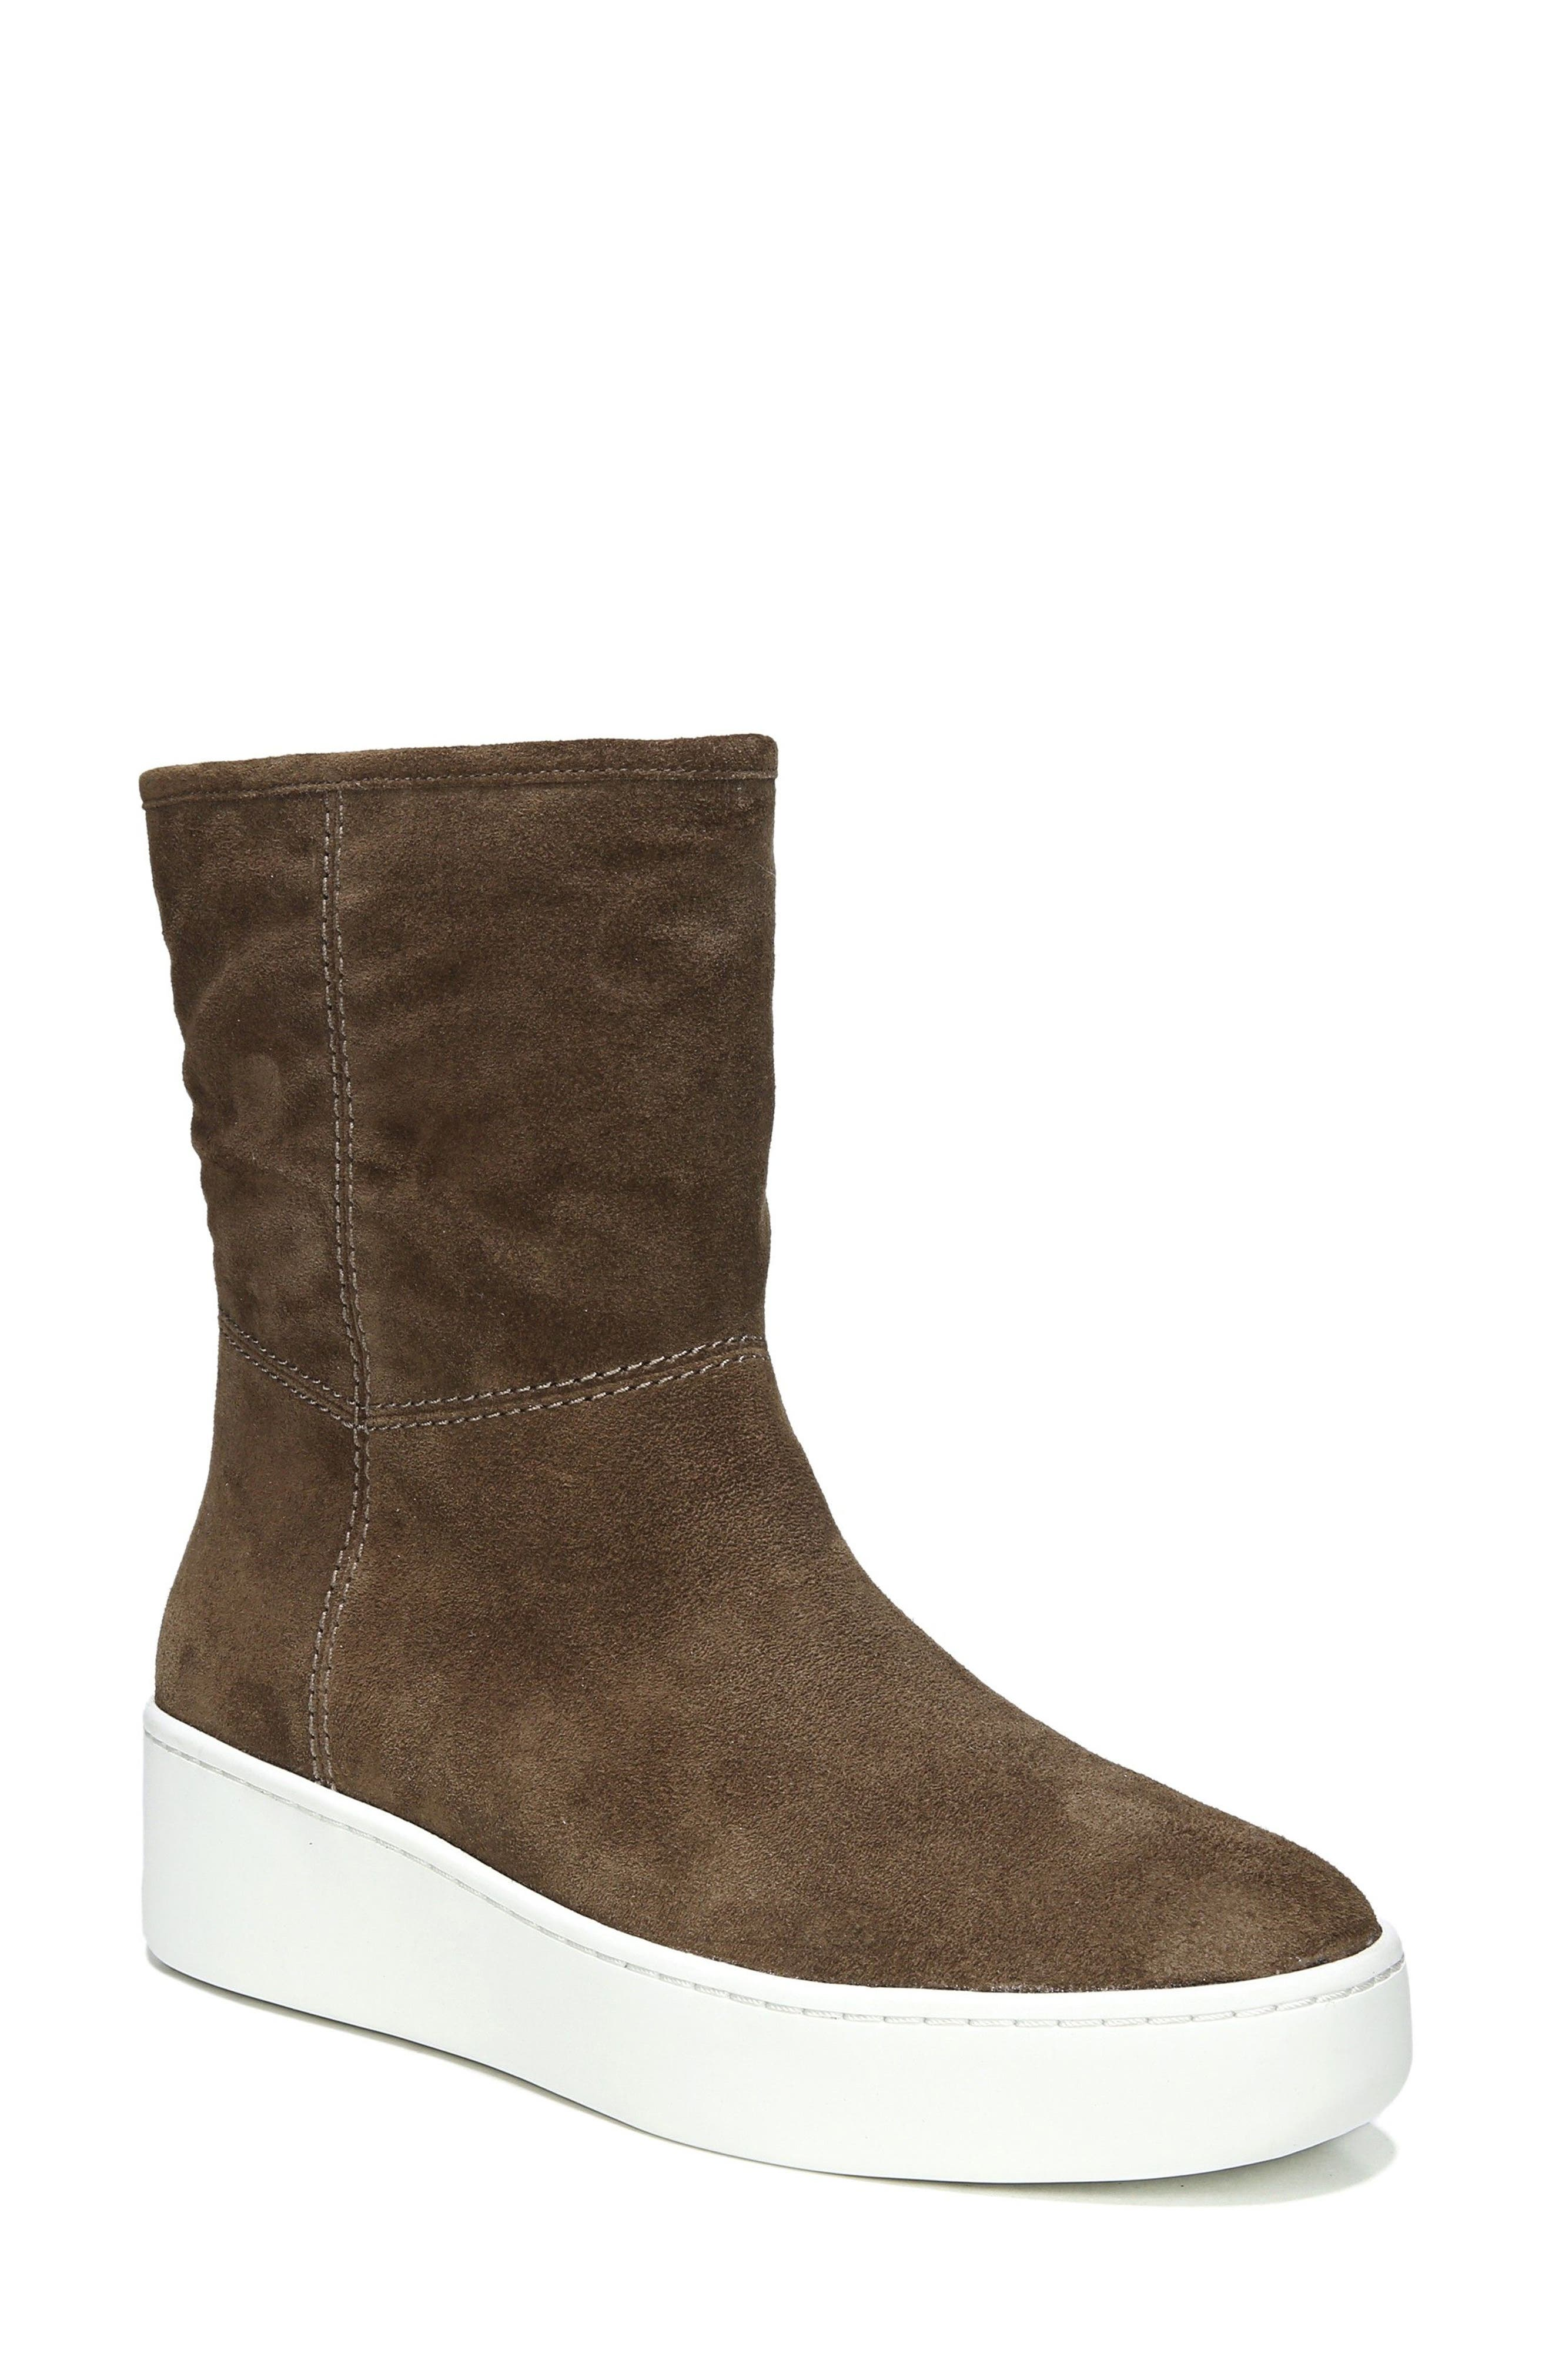 Alternate Image 1 Selected - Via Spiga Elona Genuine Shearling Lined Sneaker Boot (Women)